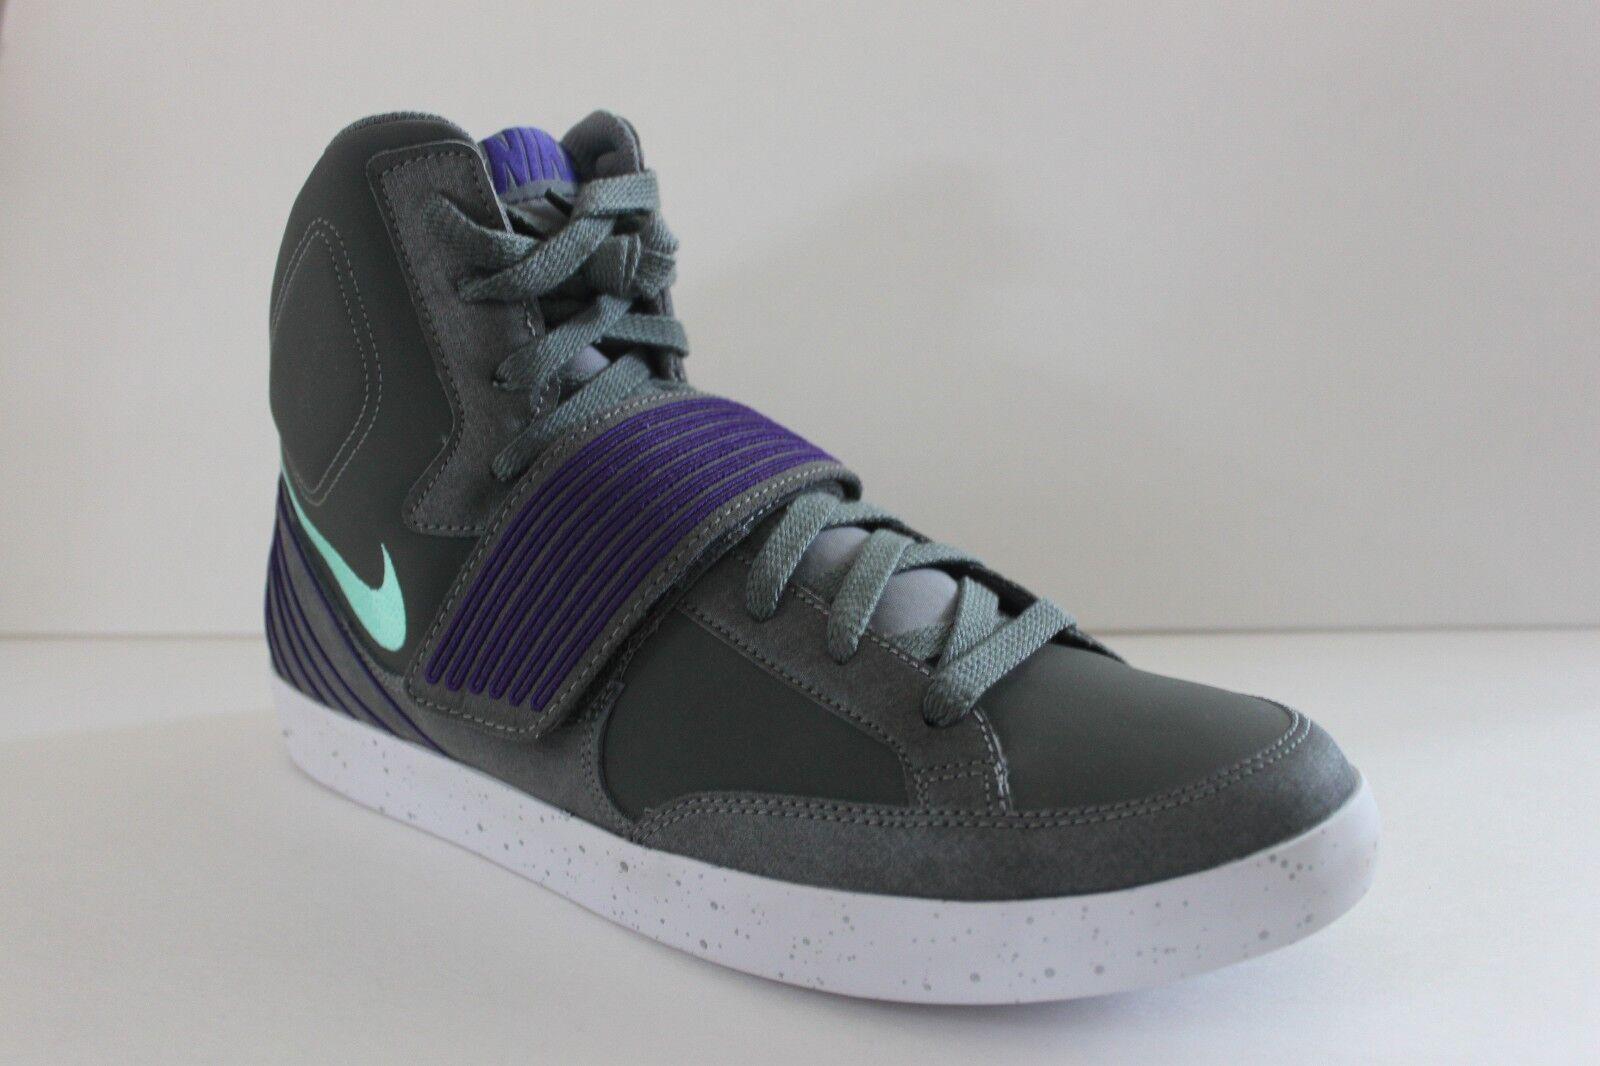 Nike Men's Skystepper Grey Purple Suede Synthetic Athletic Sneaker Shoe Size 11